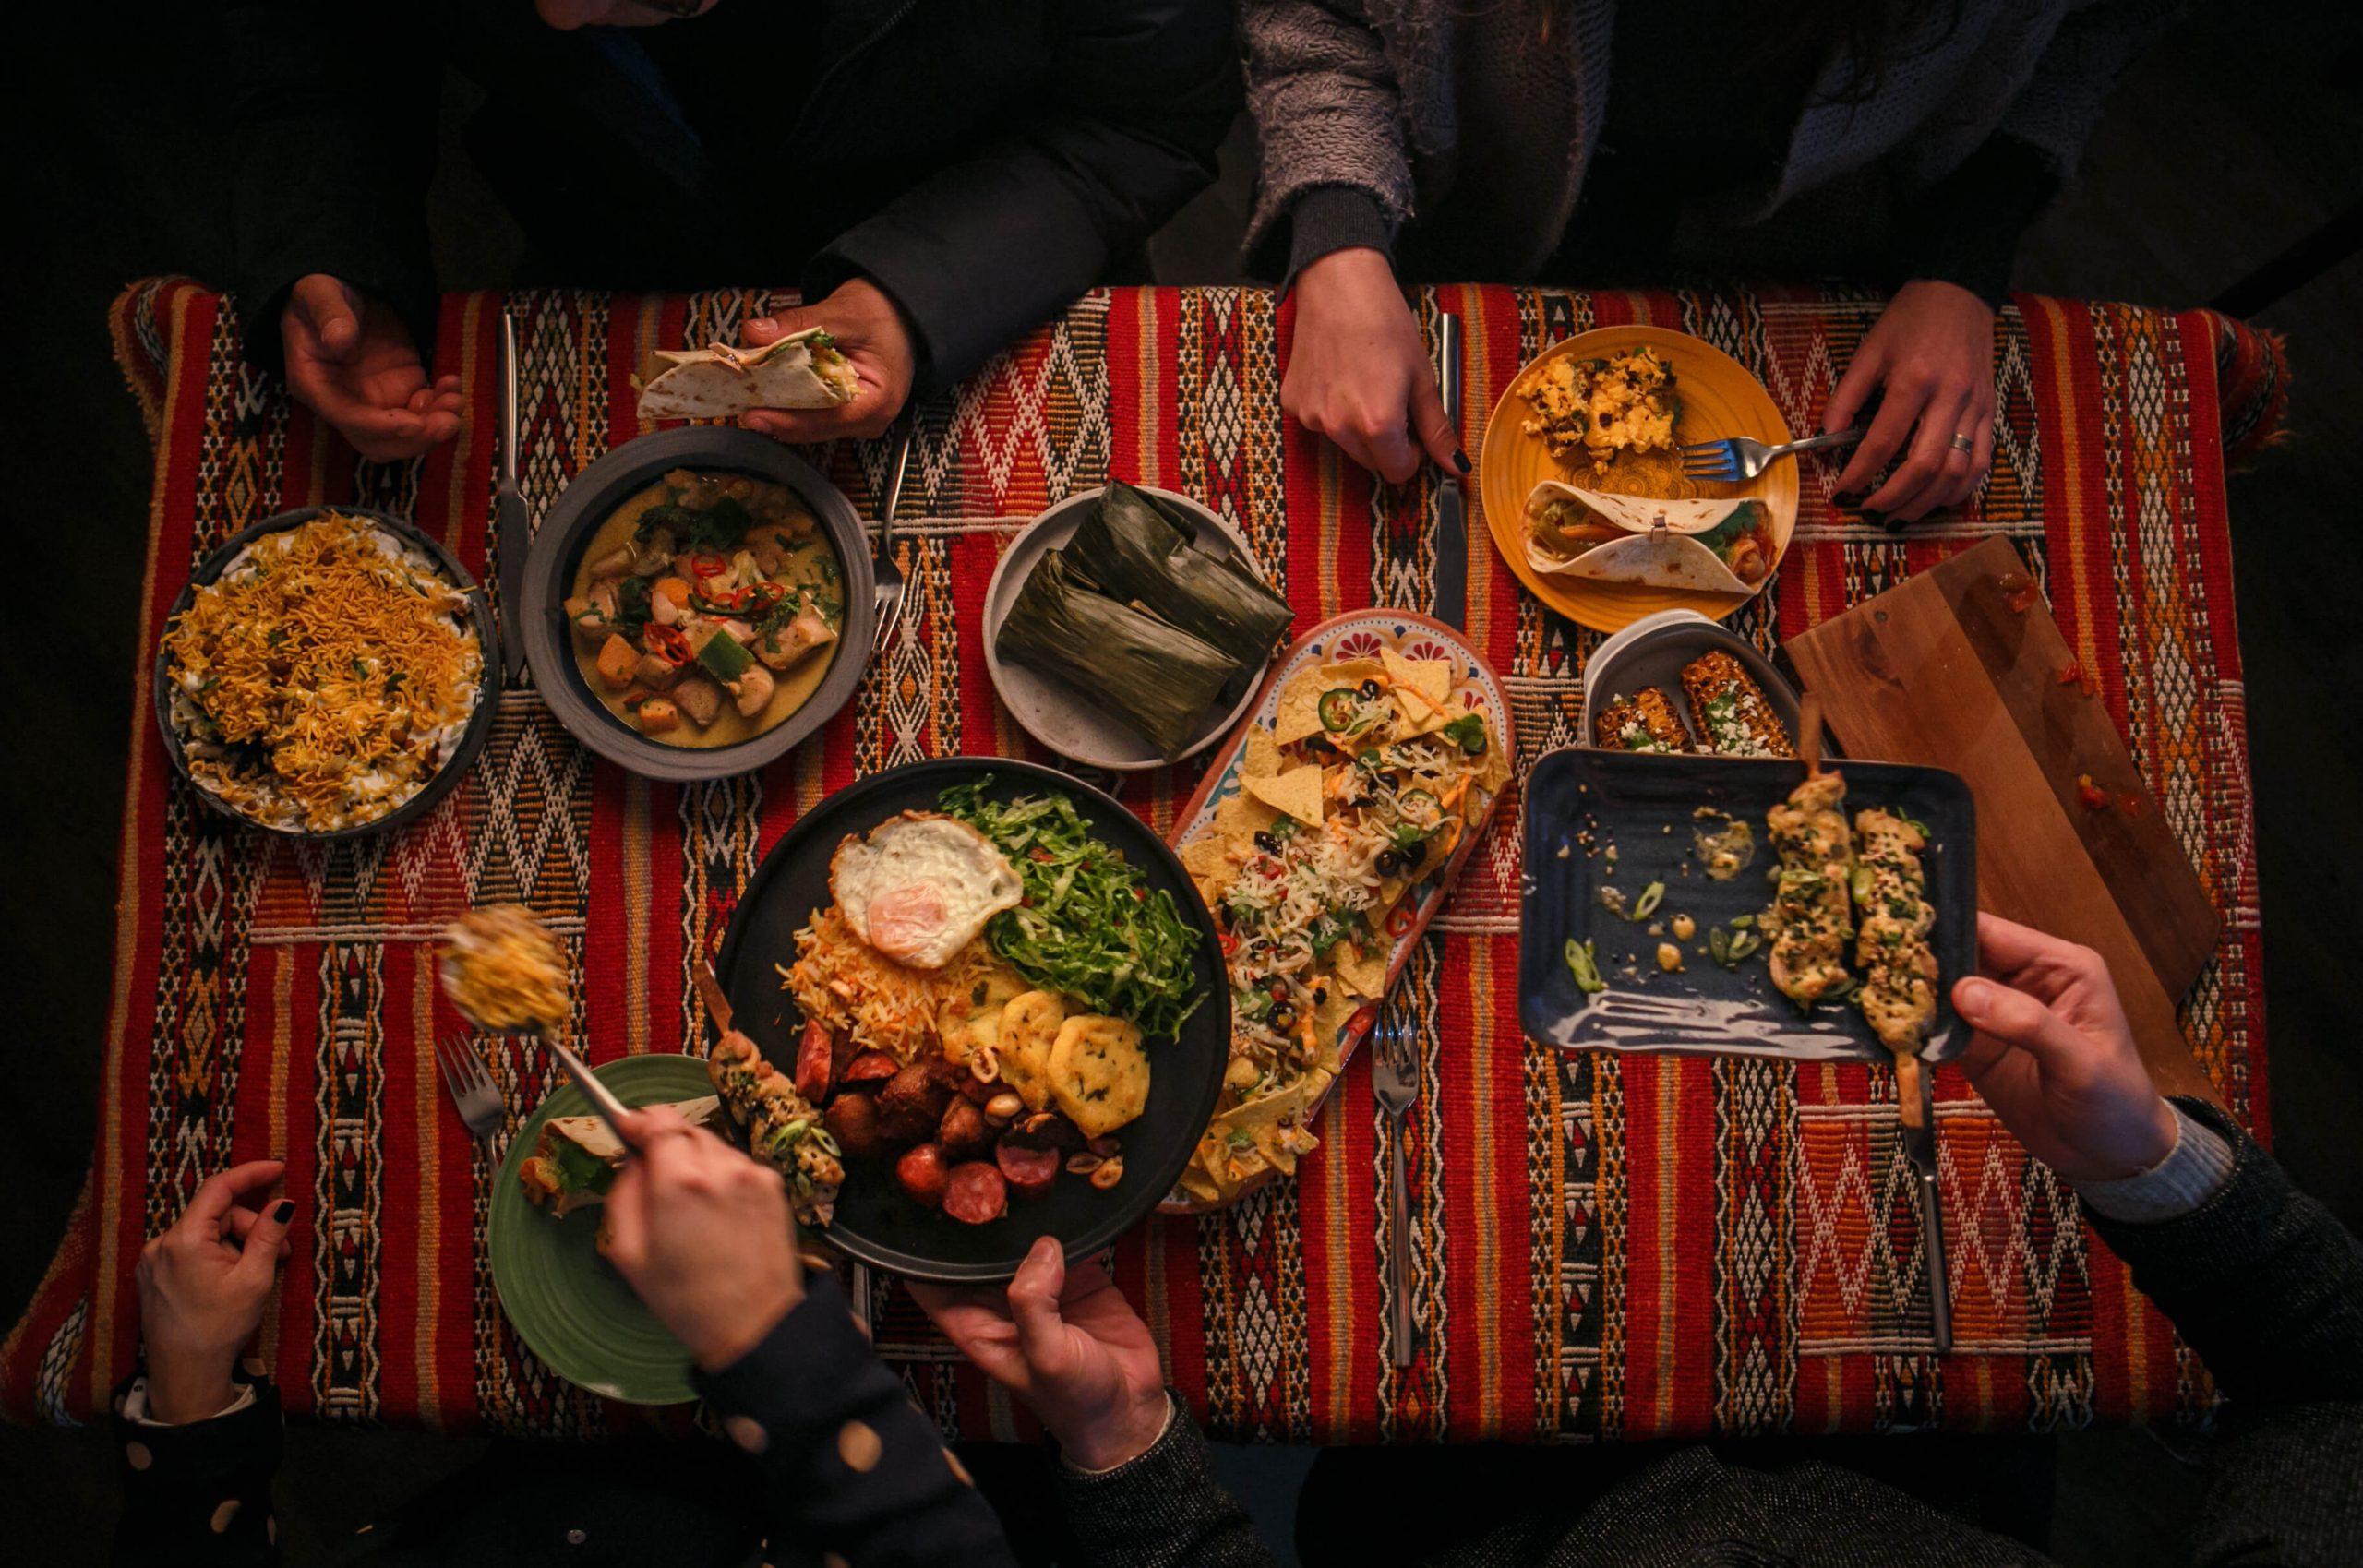 World of food - MAD-294